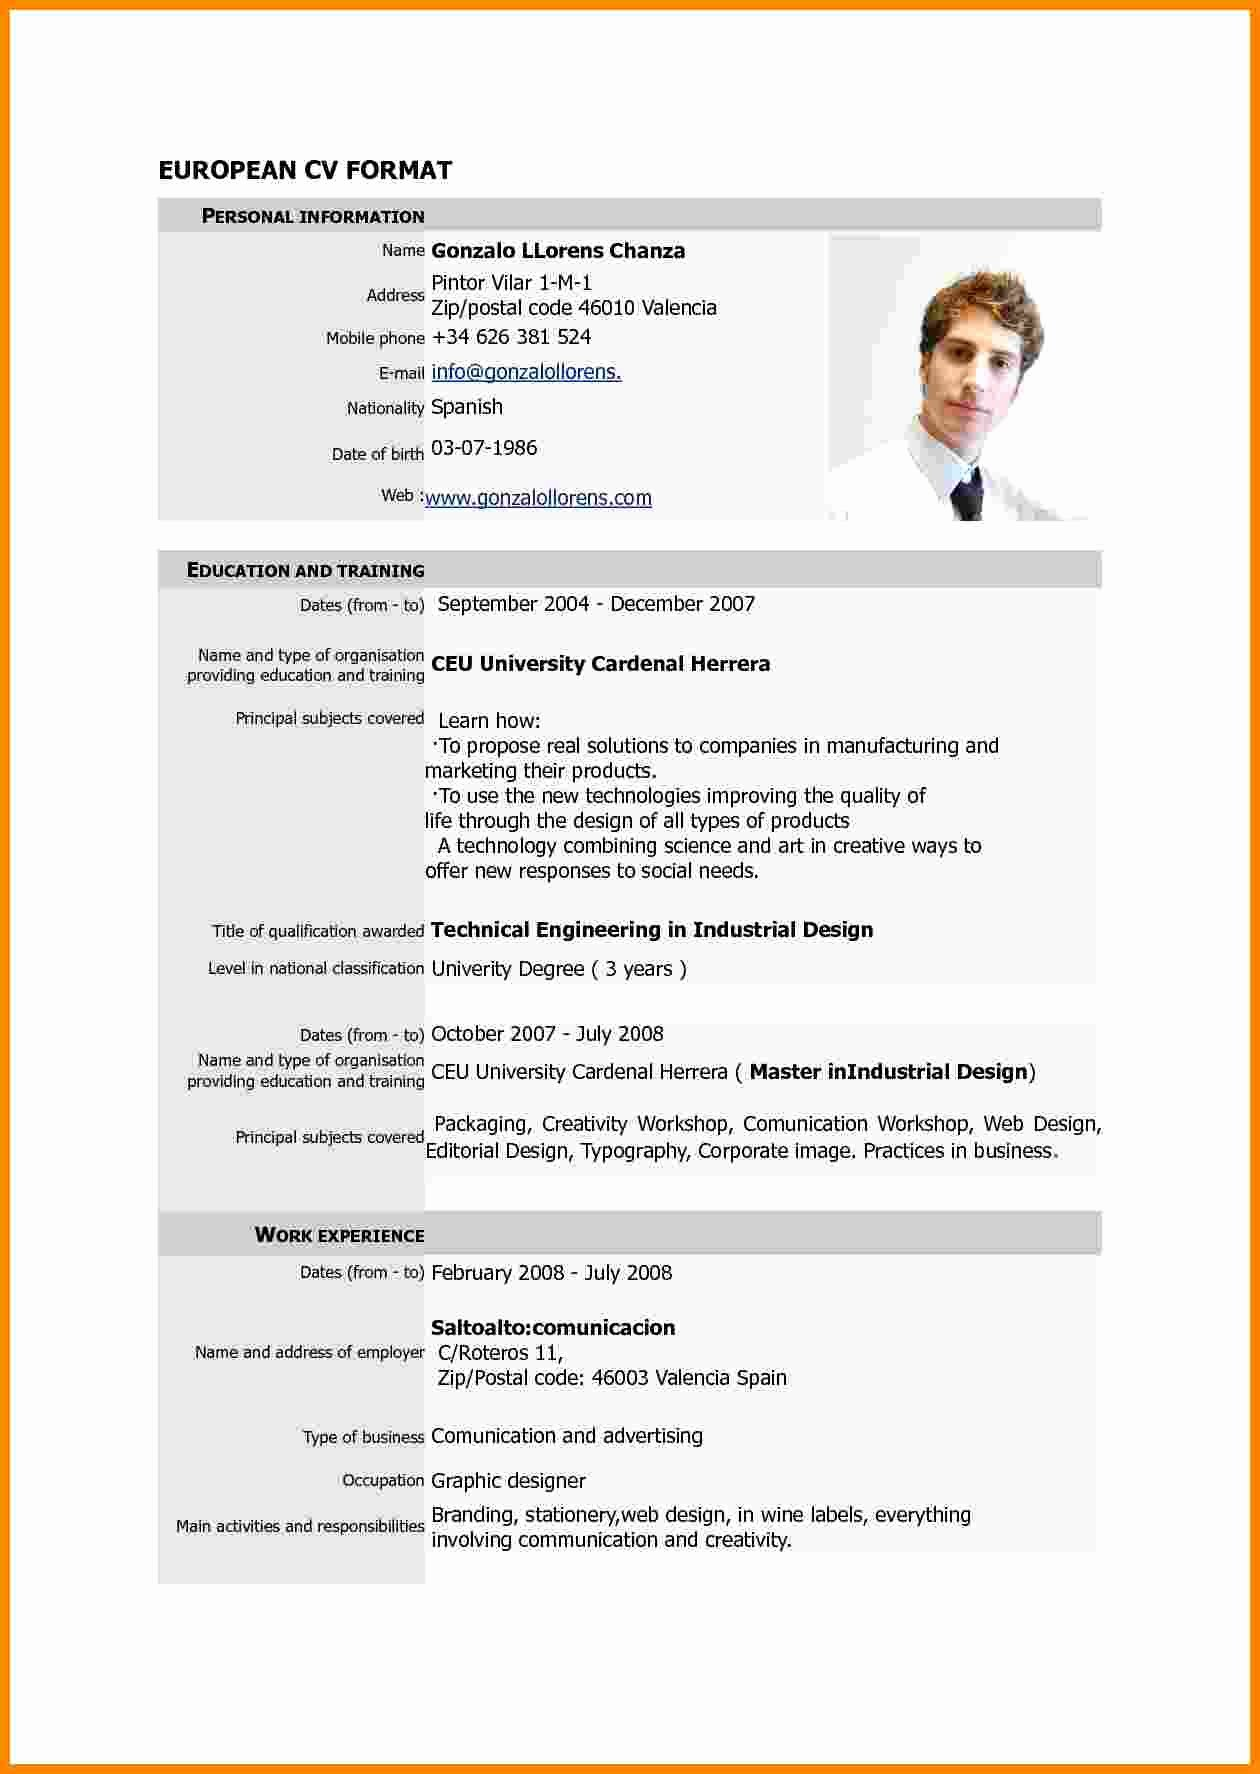 Curriculum Vitae Samples Awesome 7 Cv Resume Sample Pdf